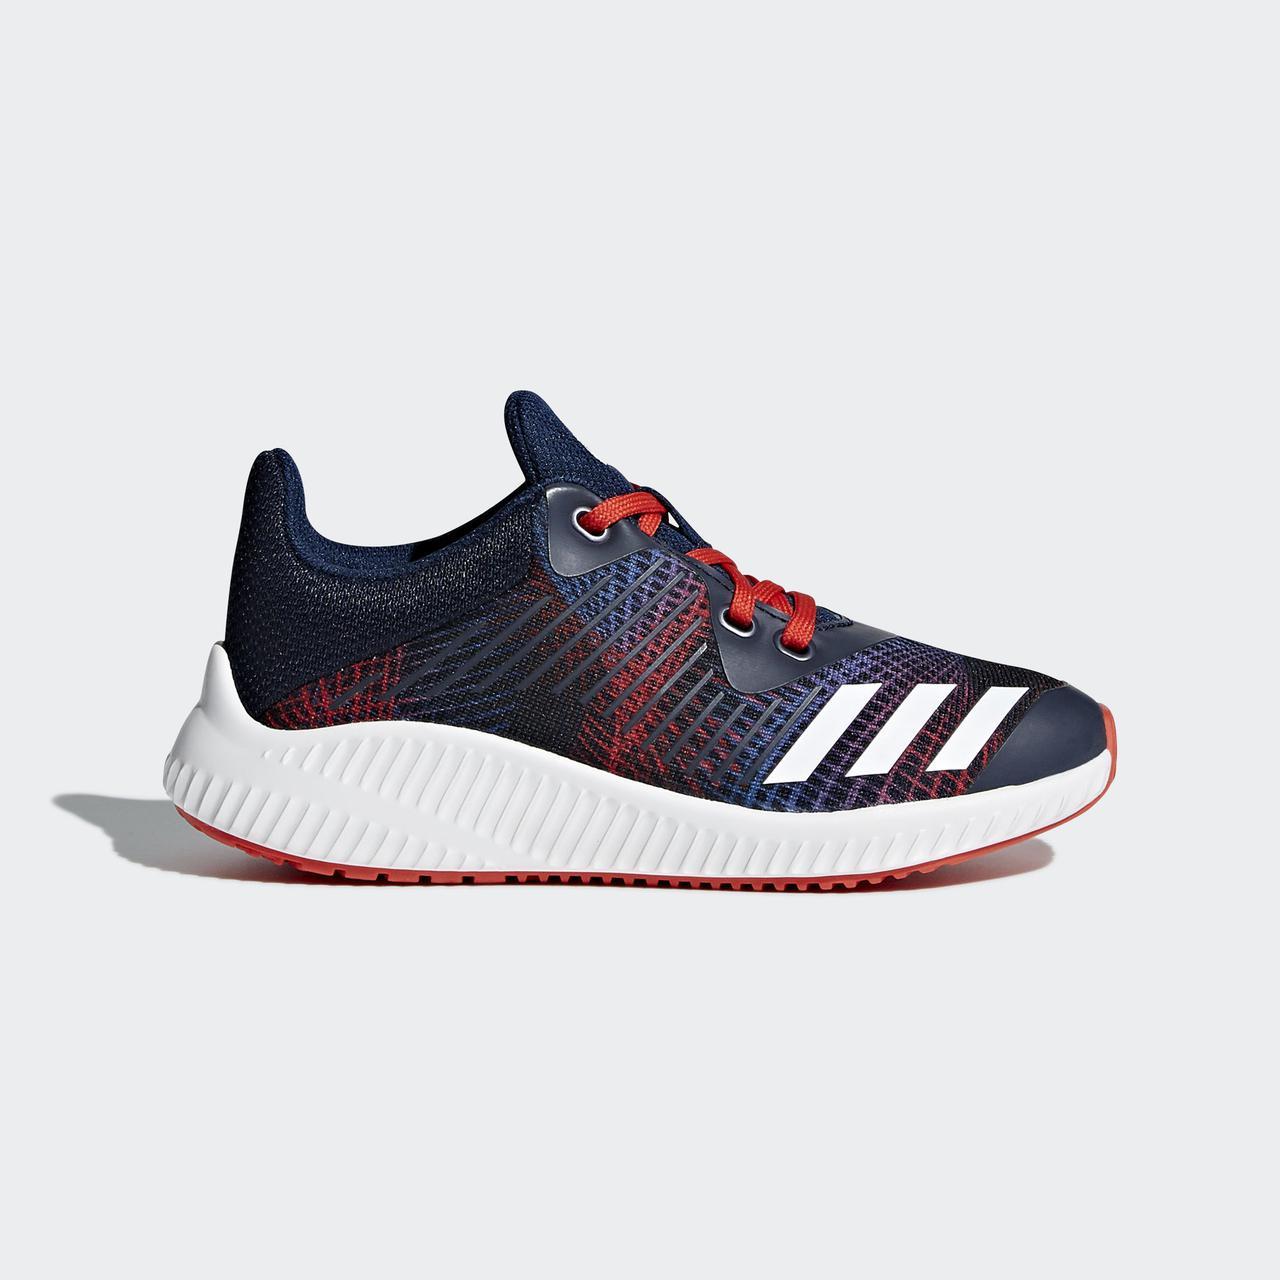 7c80b52e3 Купить Детские кроссовки Adidas Performance Fortarun (Артикул ...